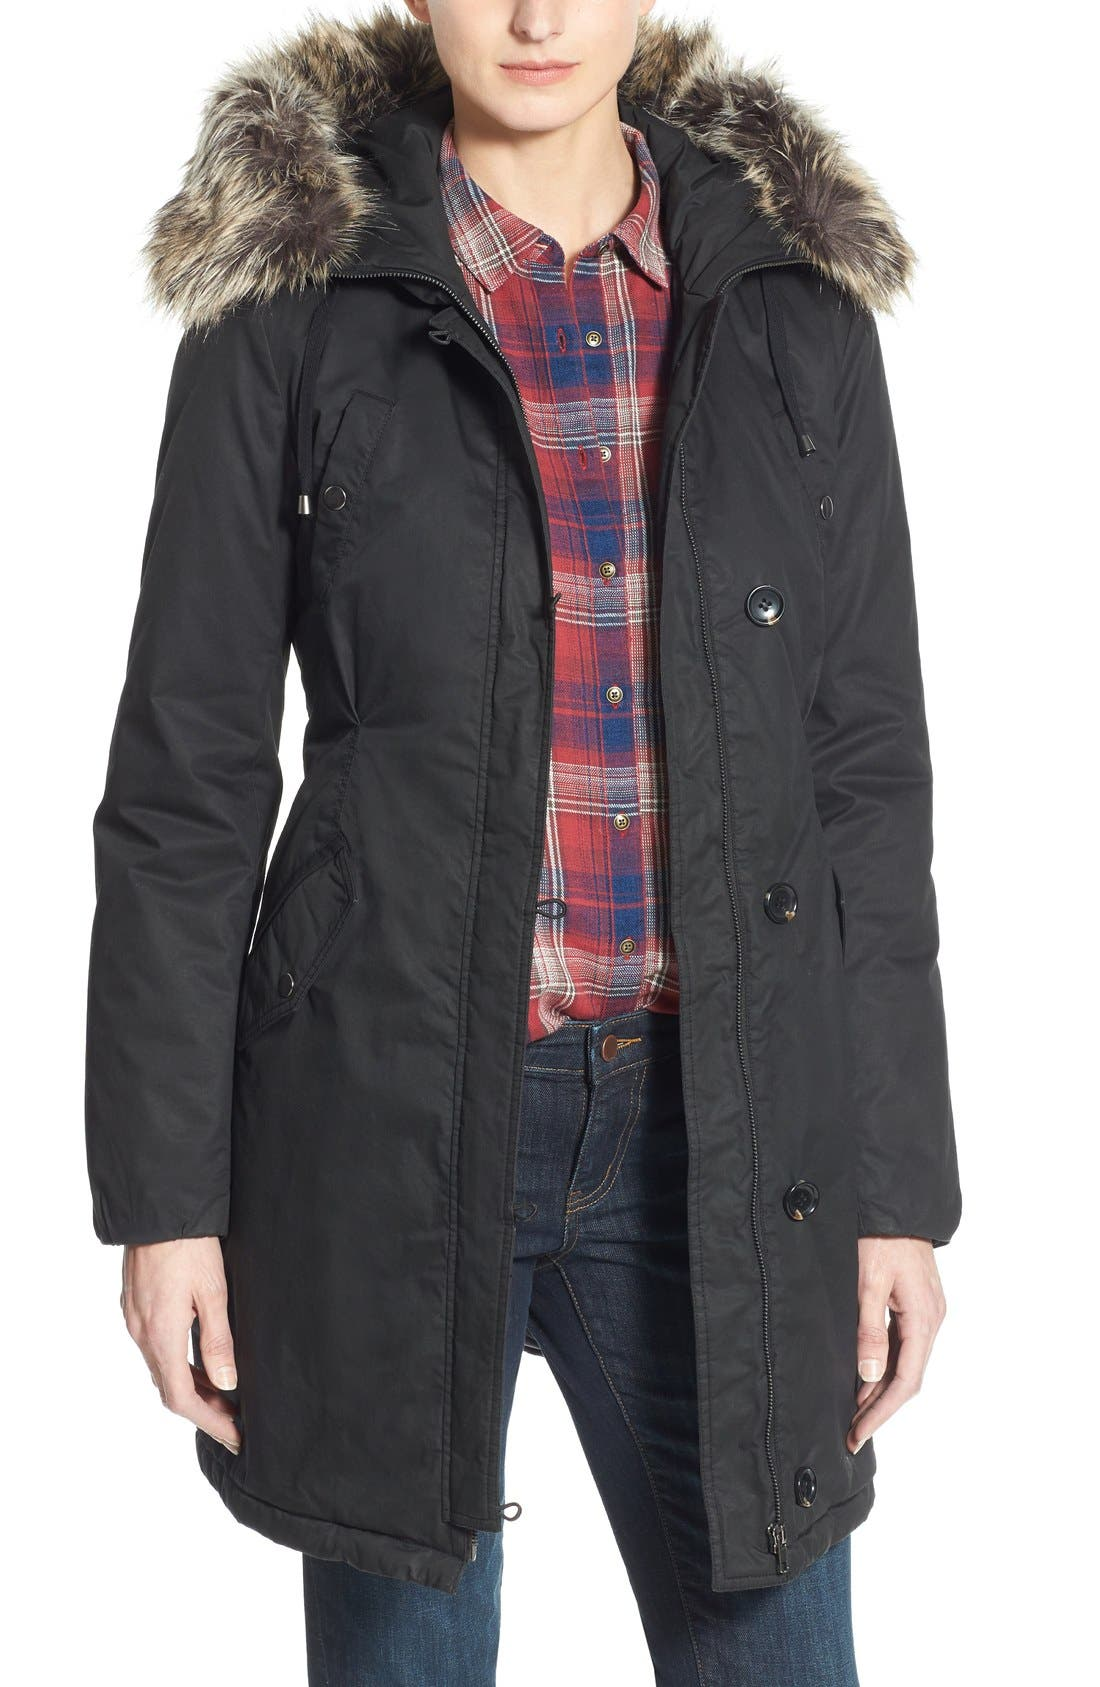 Alternate Image 1 Selected - Halogen® Hooded Parka with Faux Fur Trim (Regular & Petite)